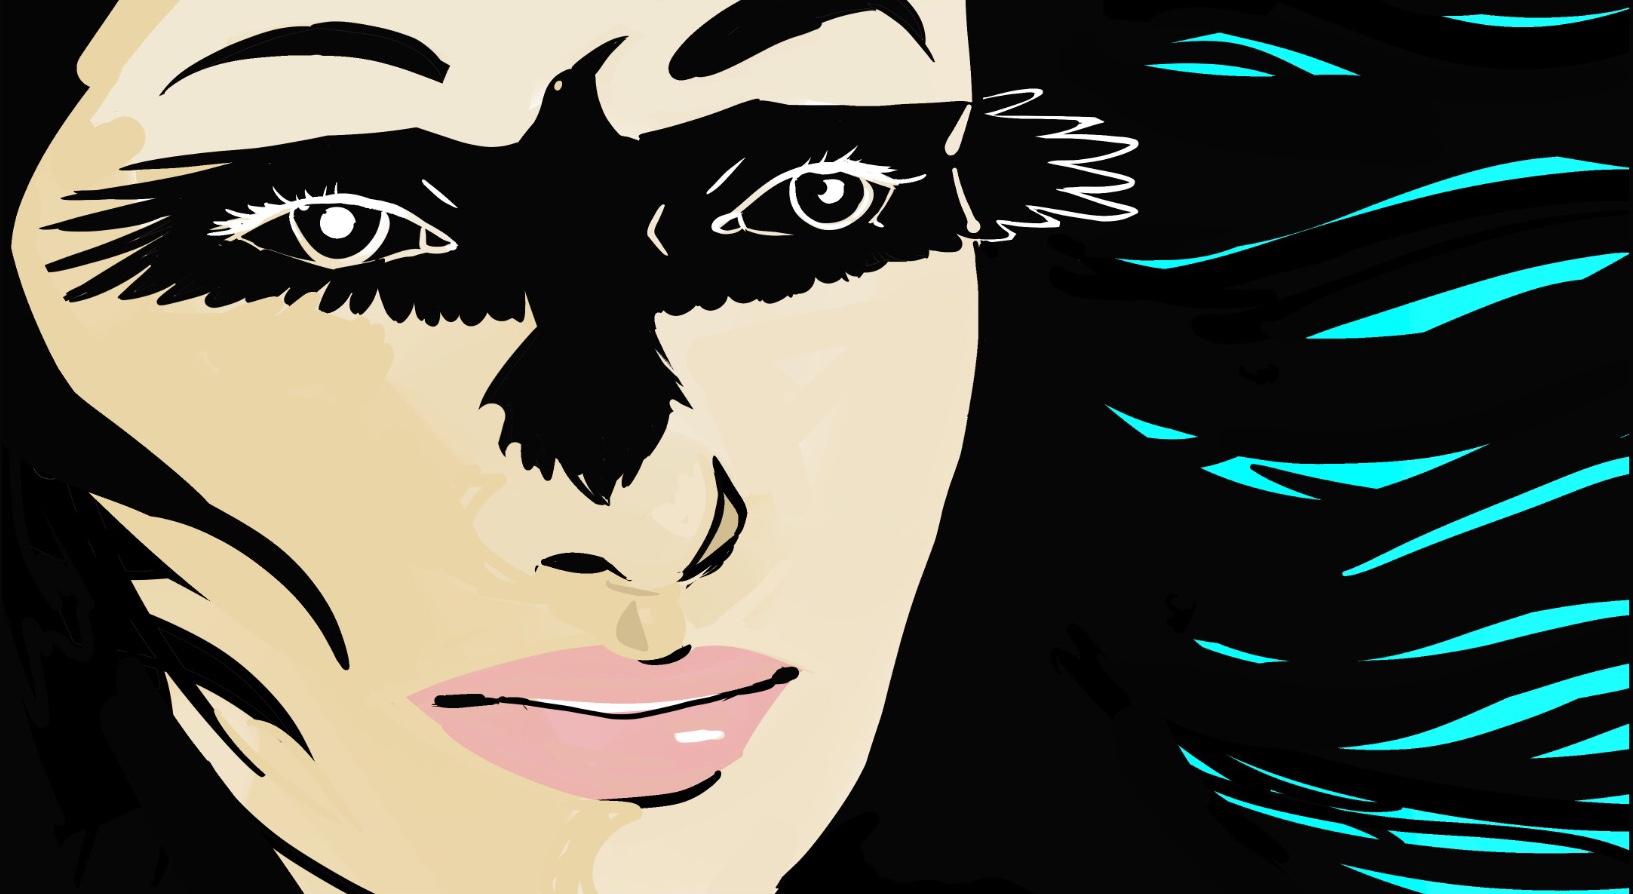 crow magnum comic laurel mchargue becky jewell artist colorado.jpg